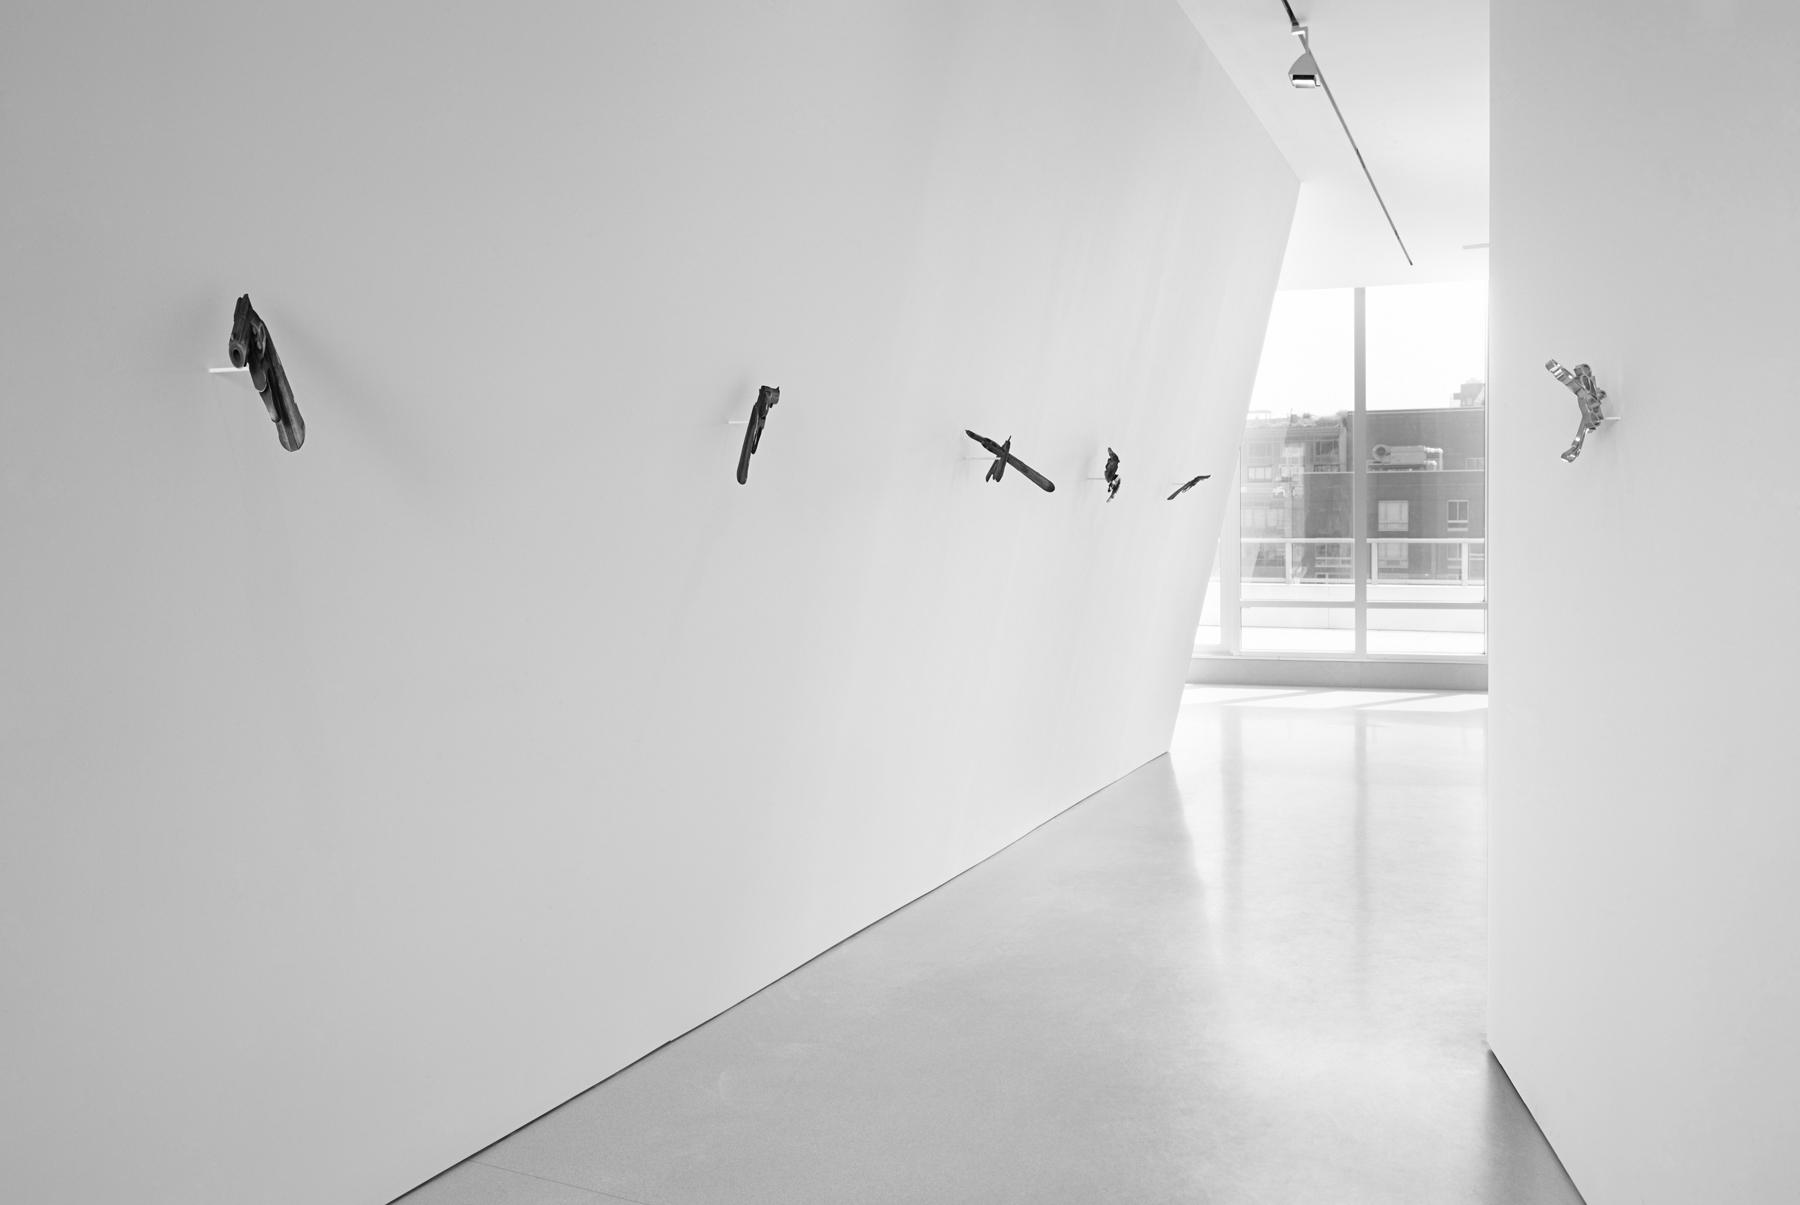 guns, knives, brass knuckles , installation view